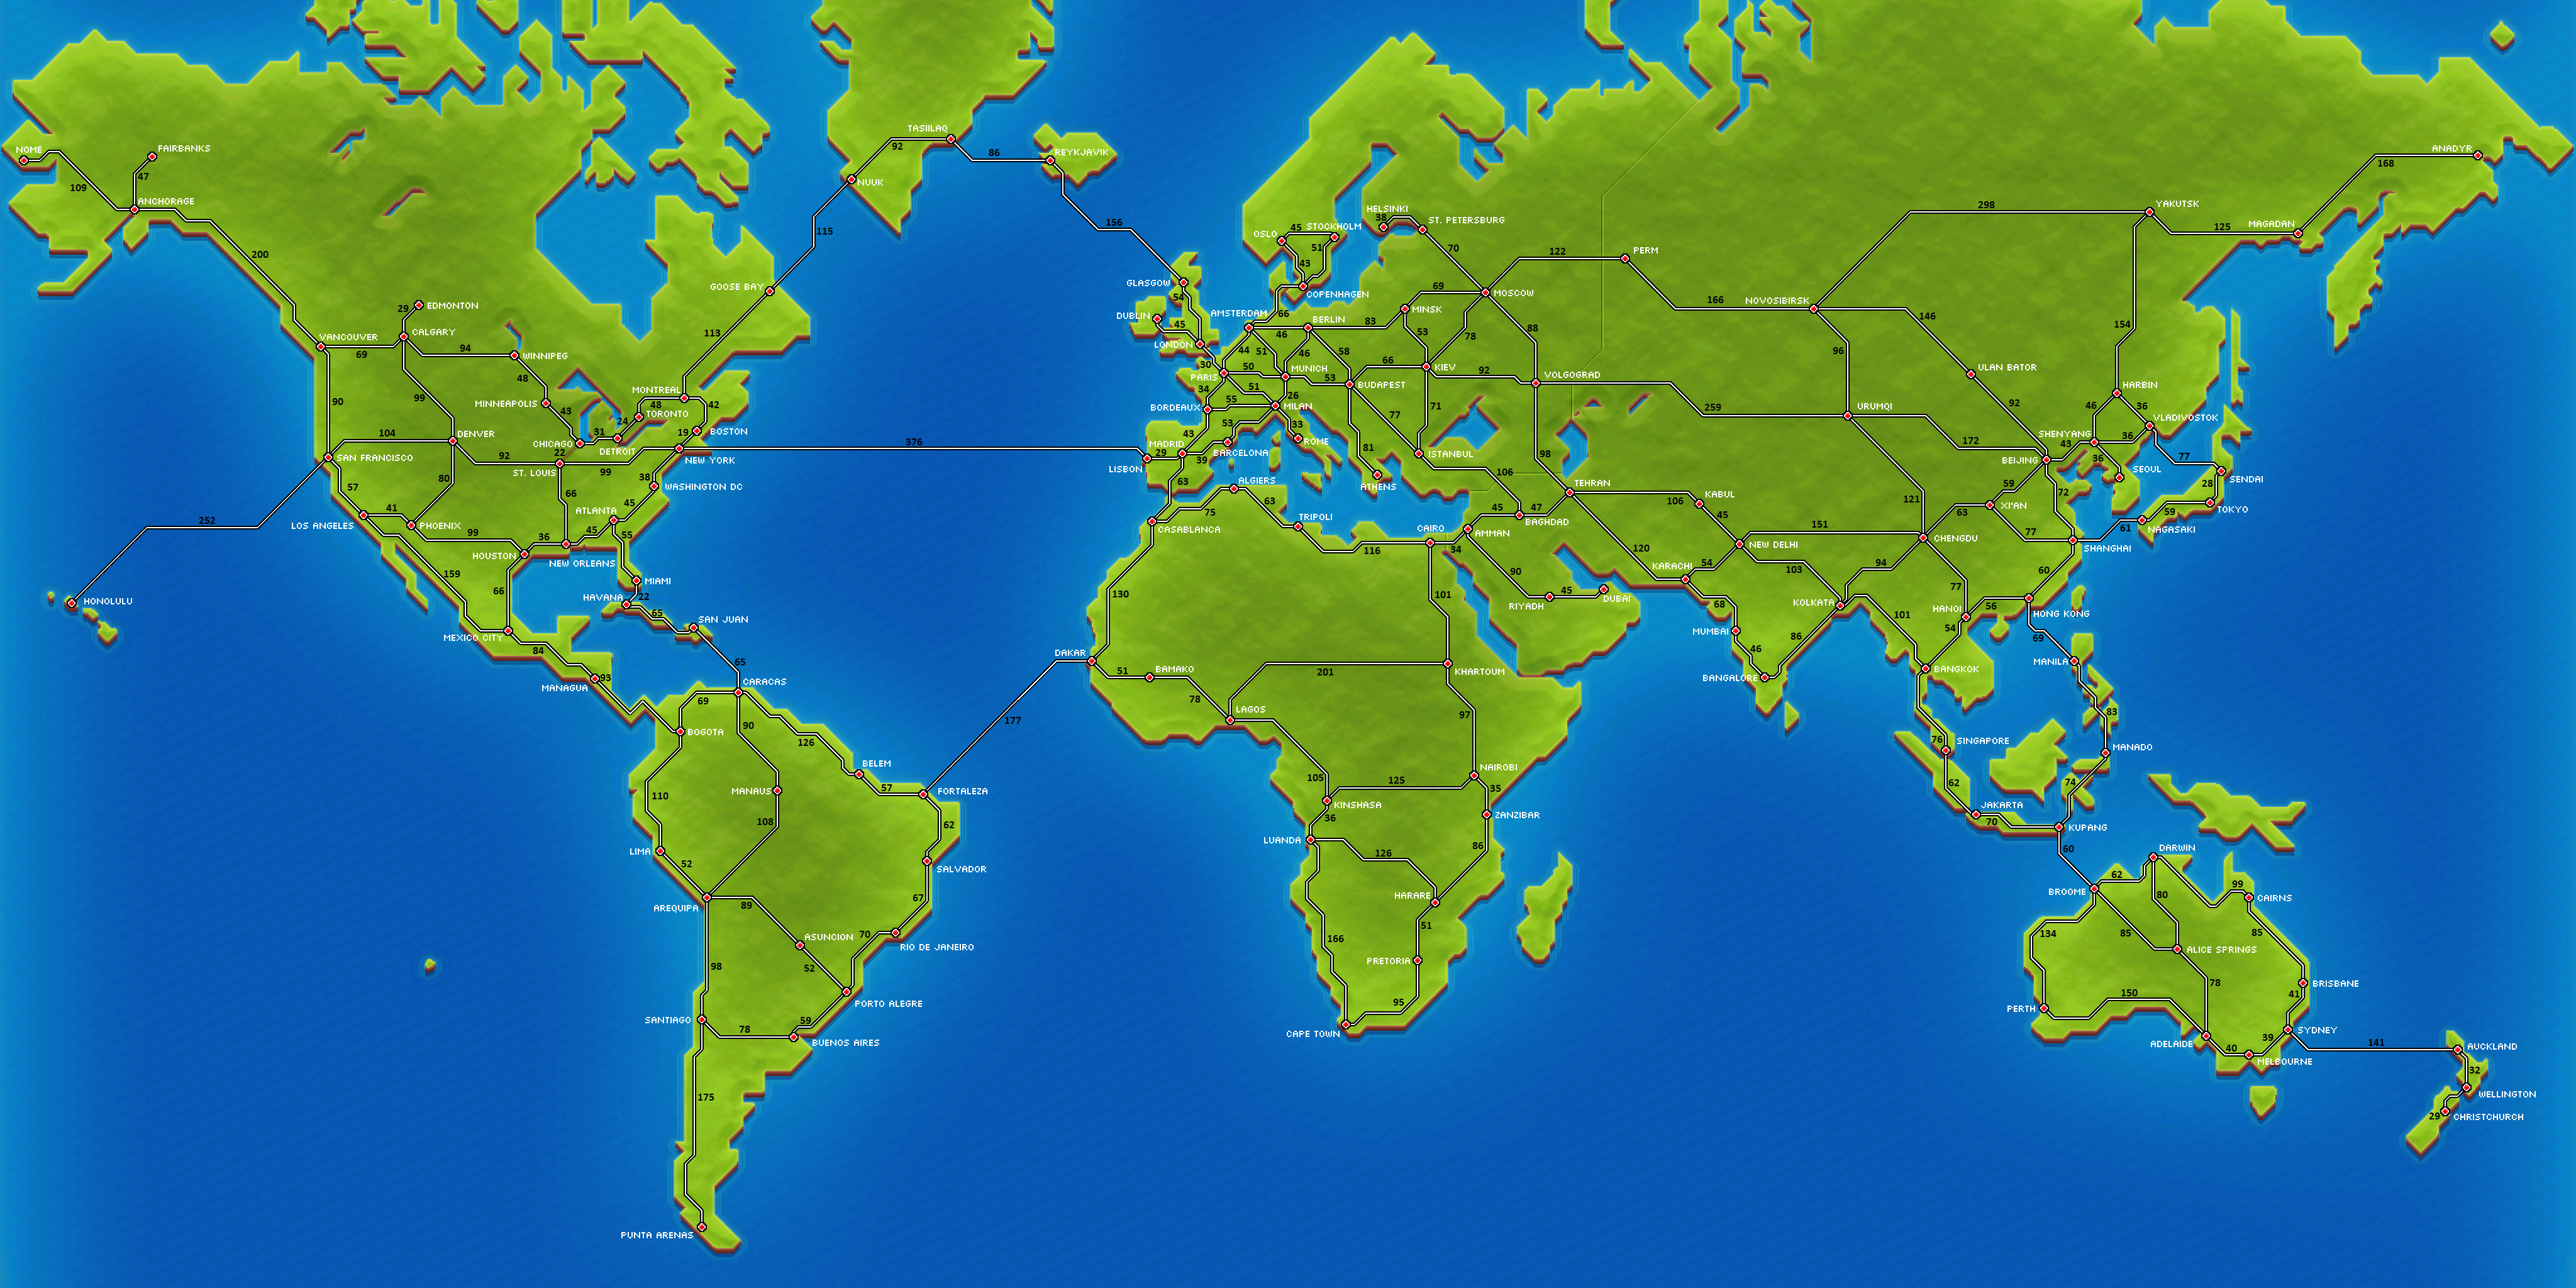 Map Pocket Trains Wiki FANDOM Powered By Wikia - Full world map